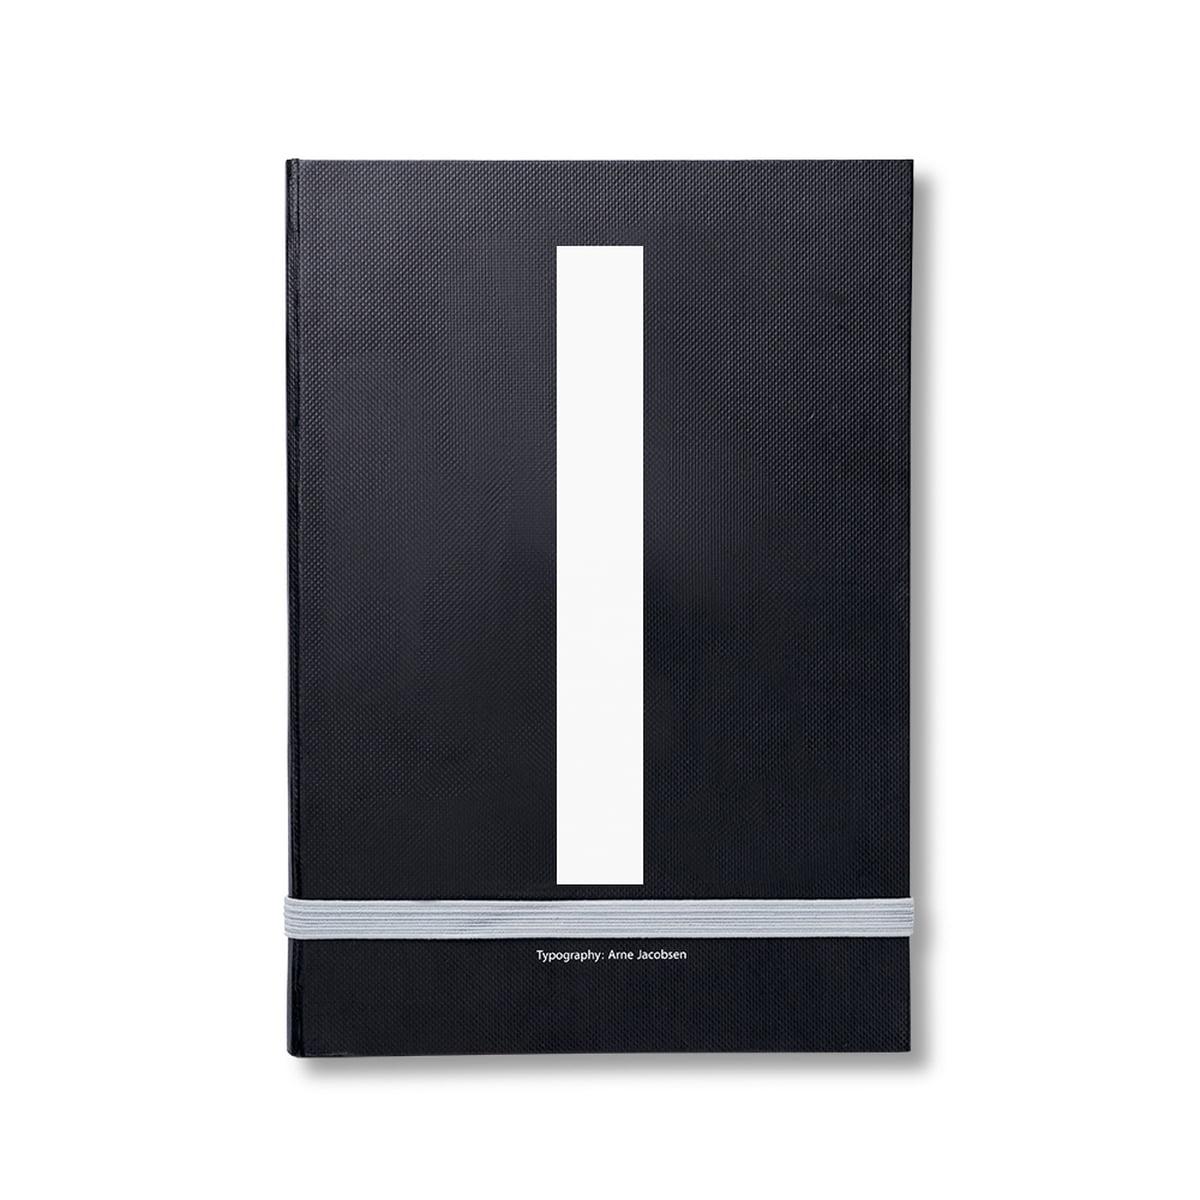 Design Letters - Personal Notizbuch von A-Z, I | Dekoration | Schwarz | 80g papier | Design Letters